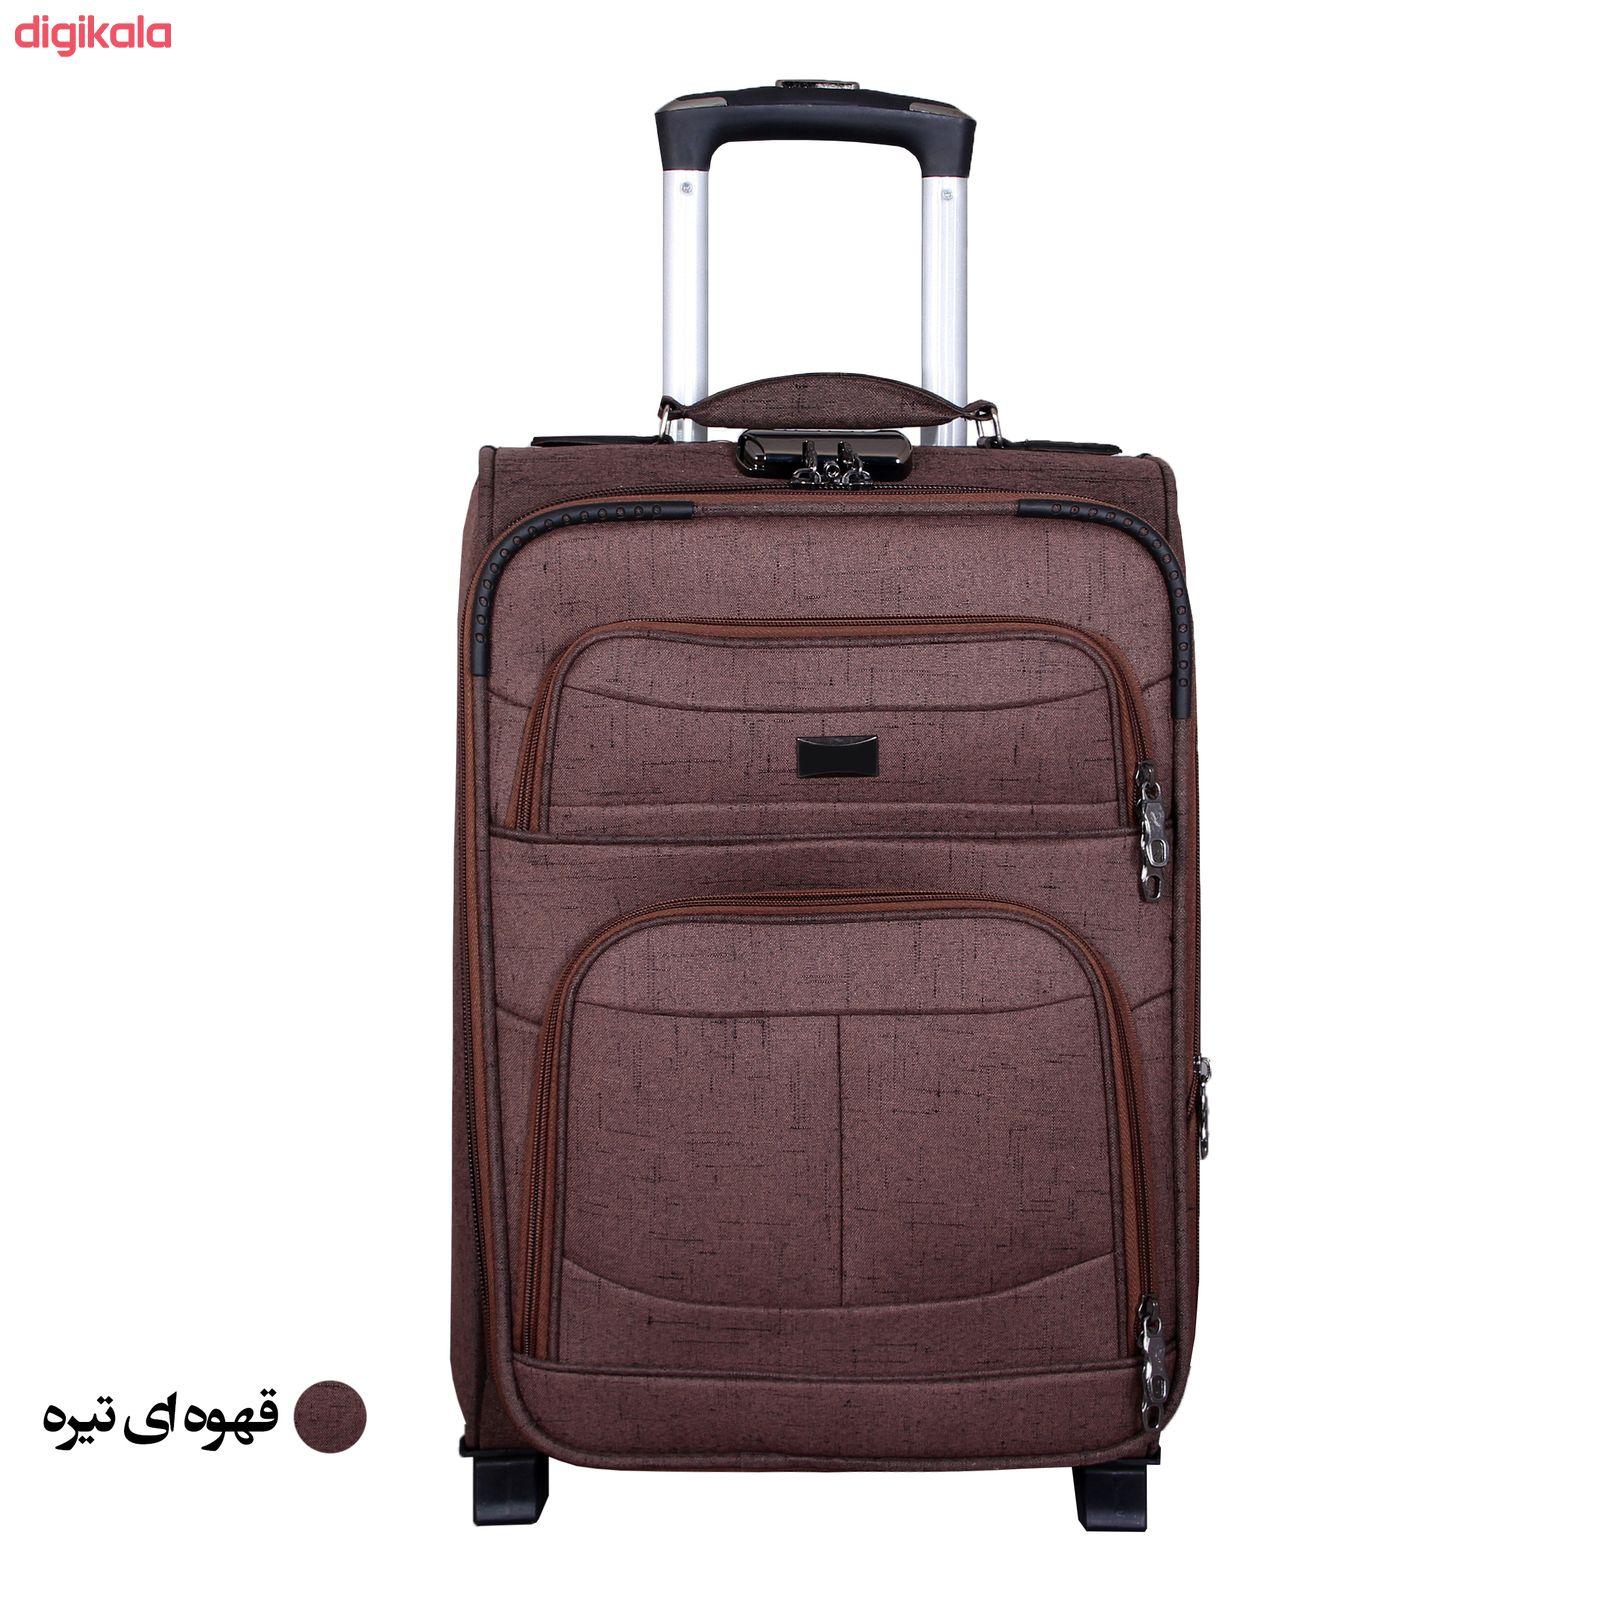 مجموعه سه عددی چمدان کد 2301A main 1 2